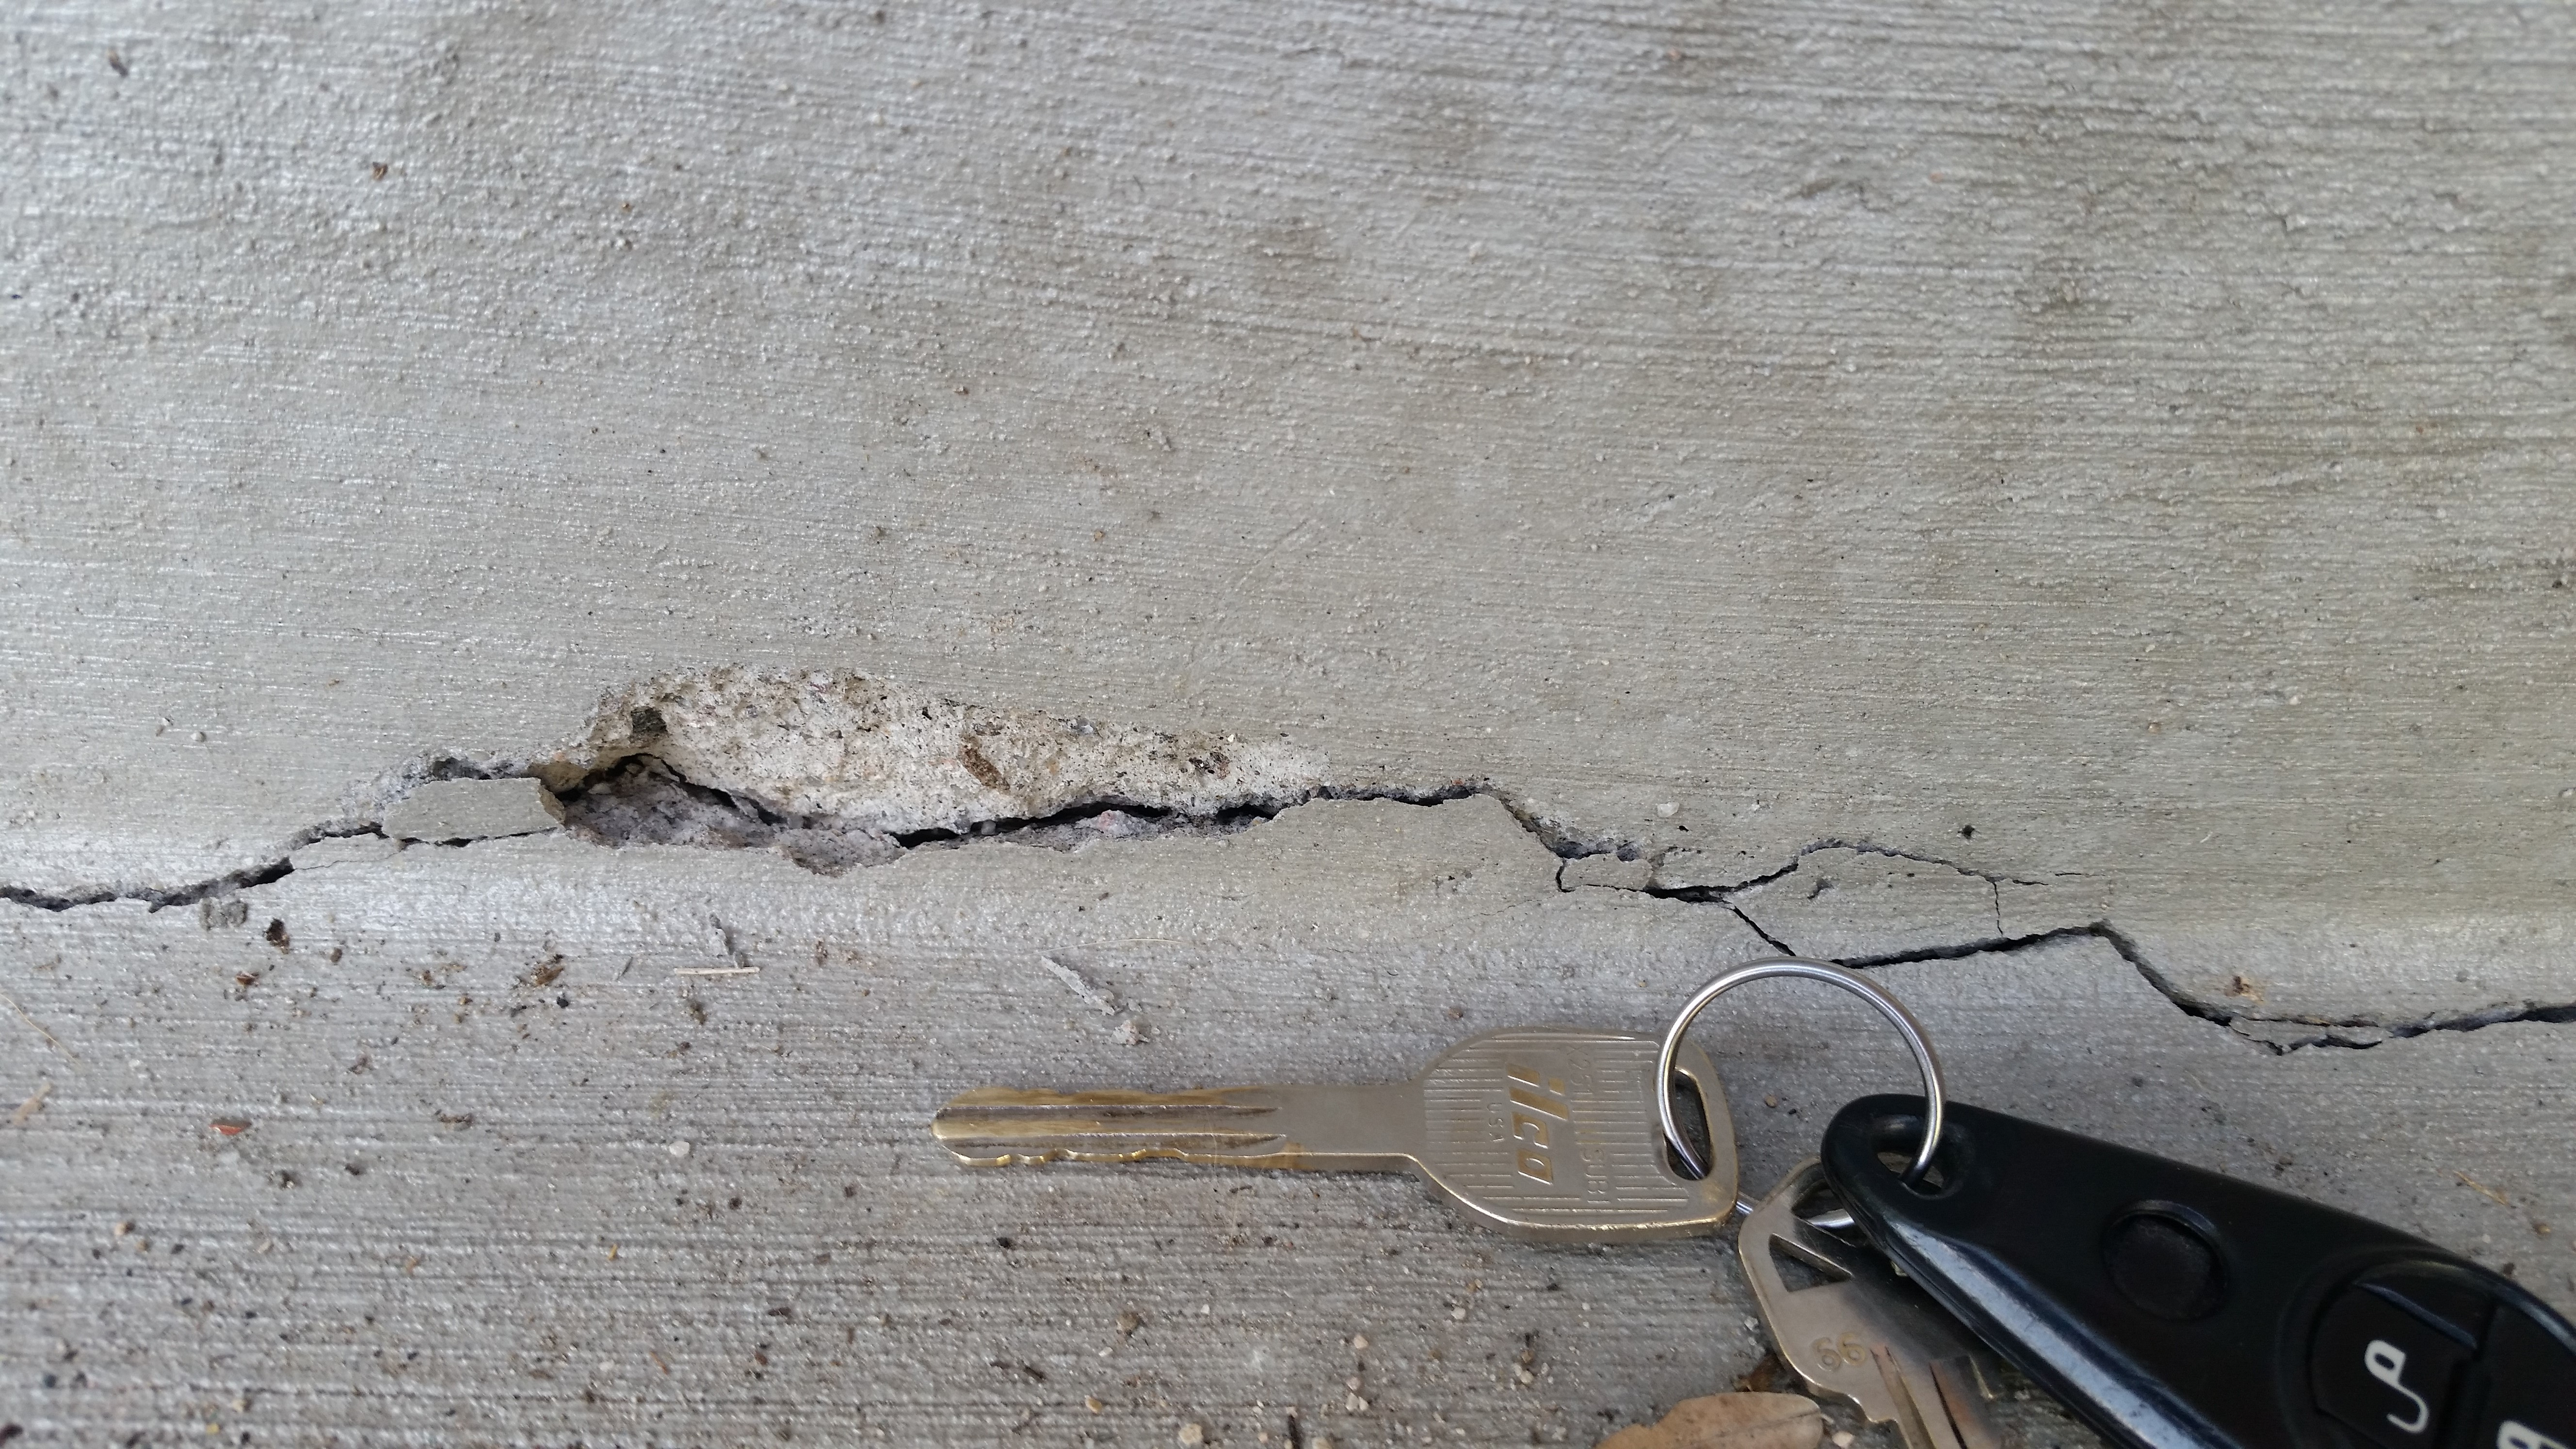 Concrete damage-step.jpg